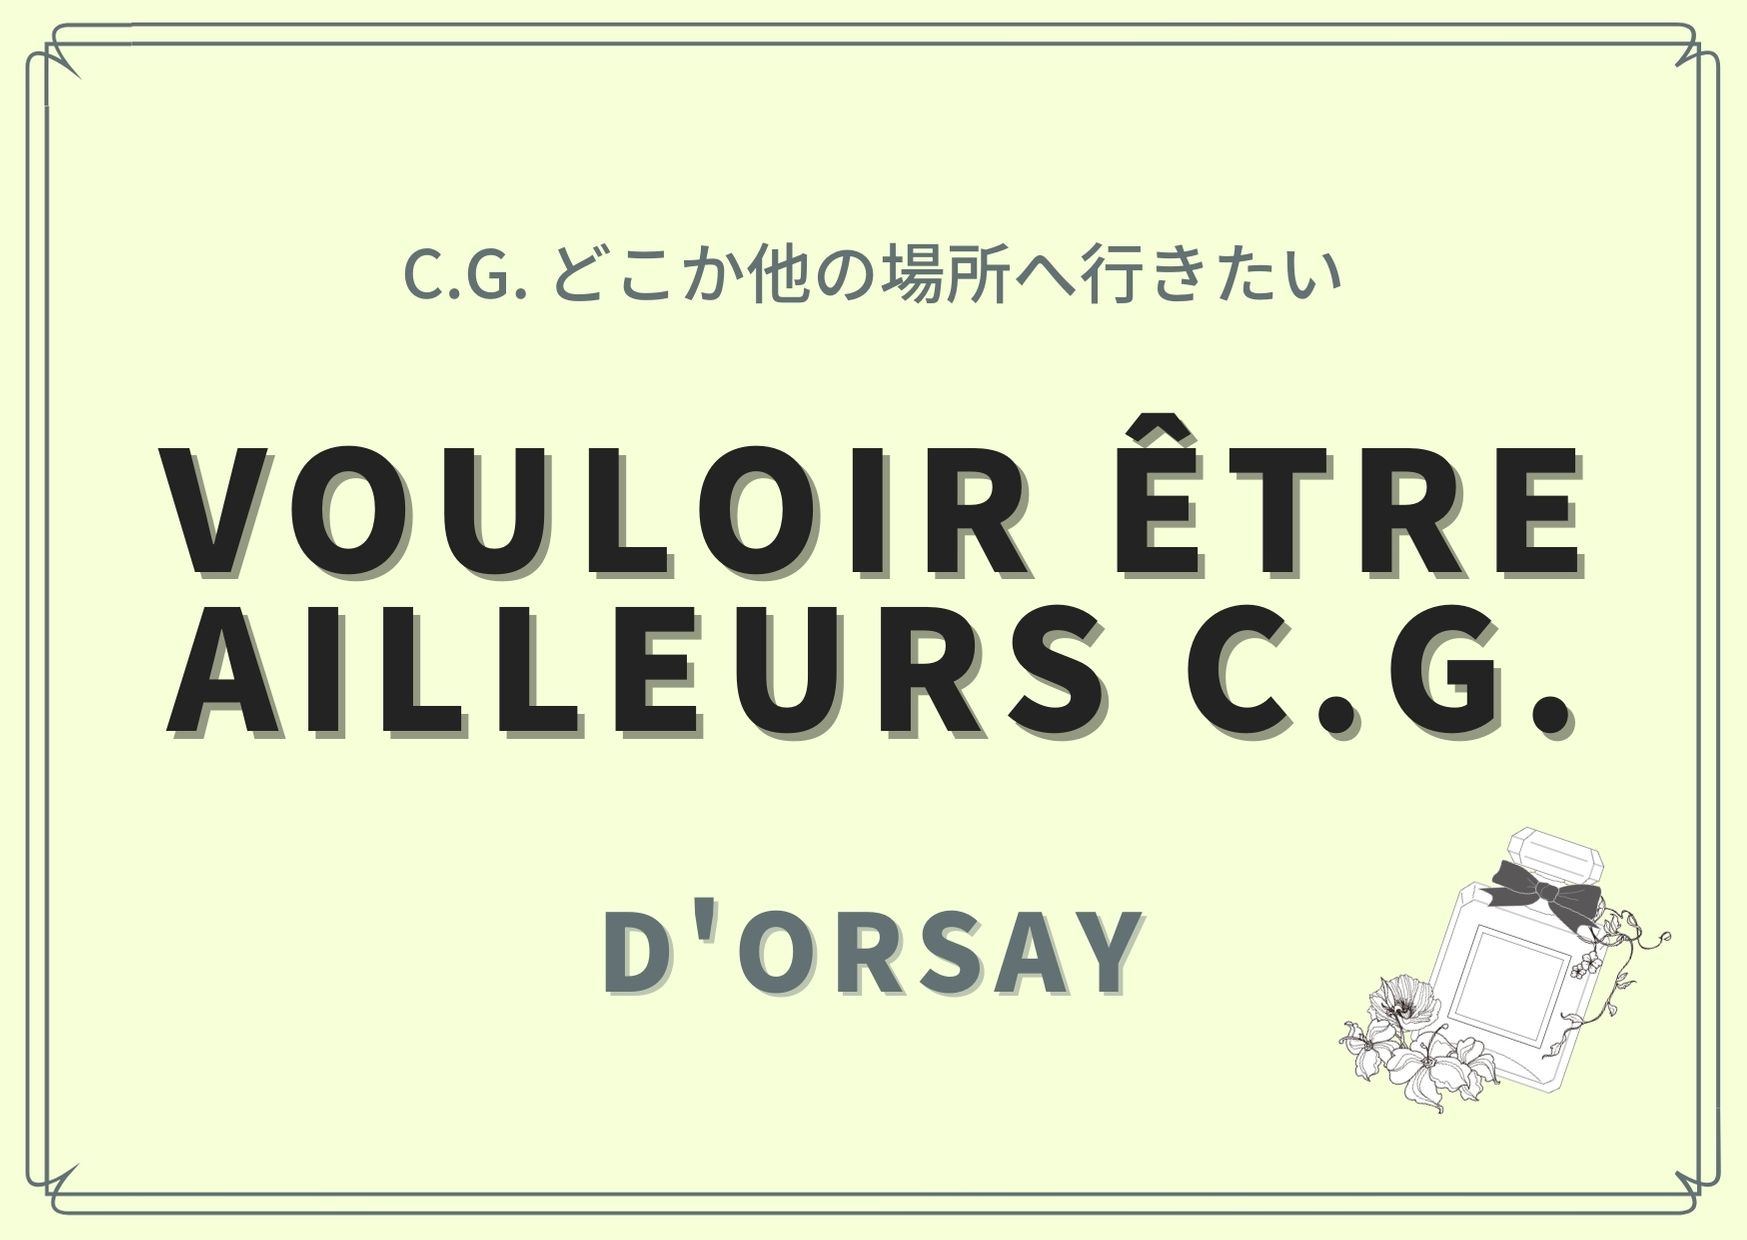 Vouloir Être Ailleurs C.G.(C.G. どこか他の場所へ行きたい)/D'ORSAY(ドルセー)